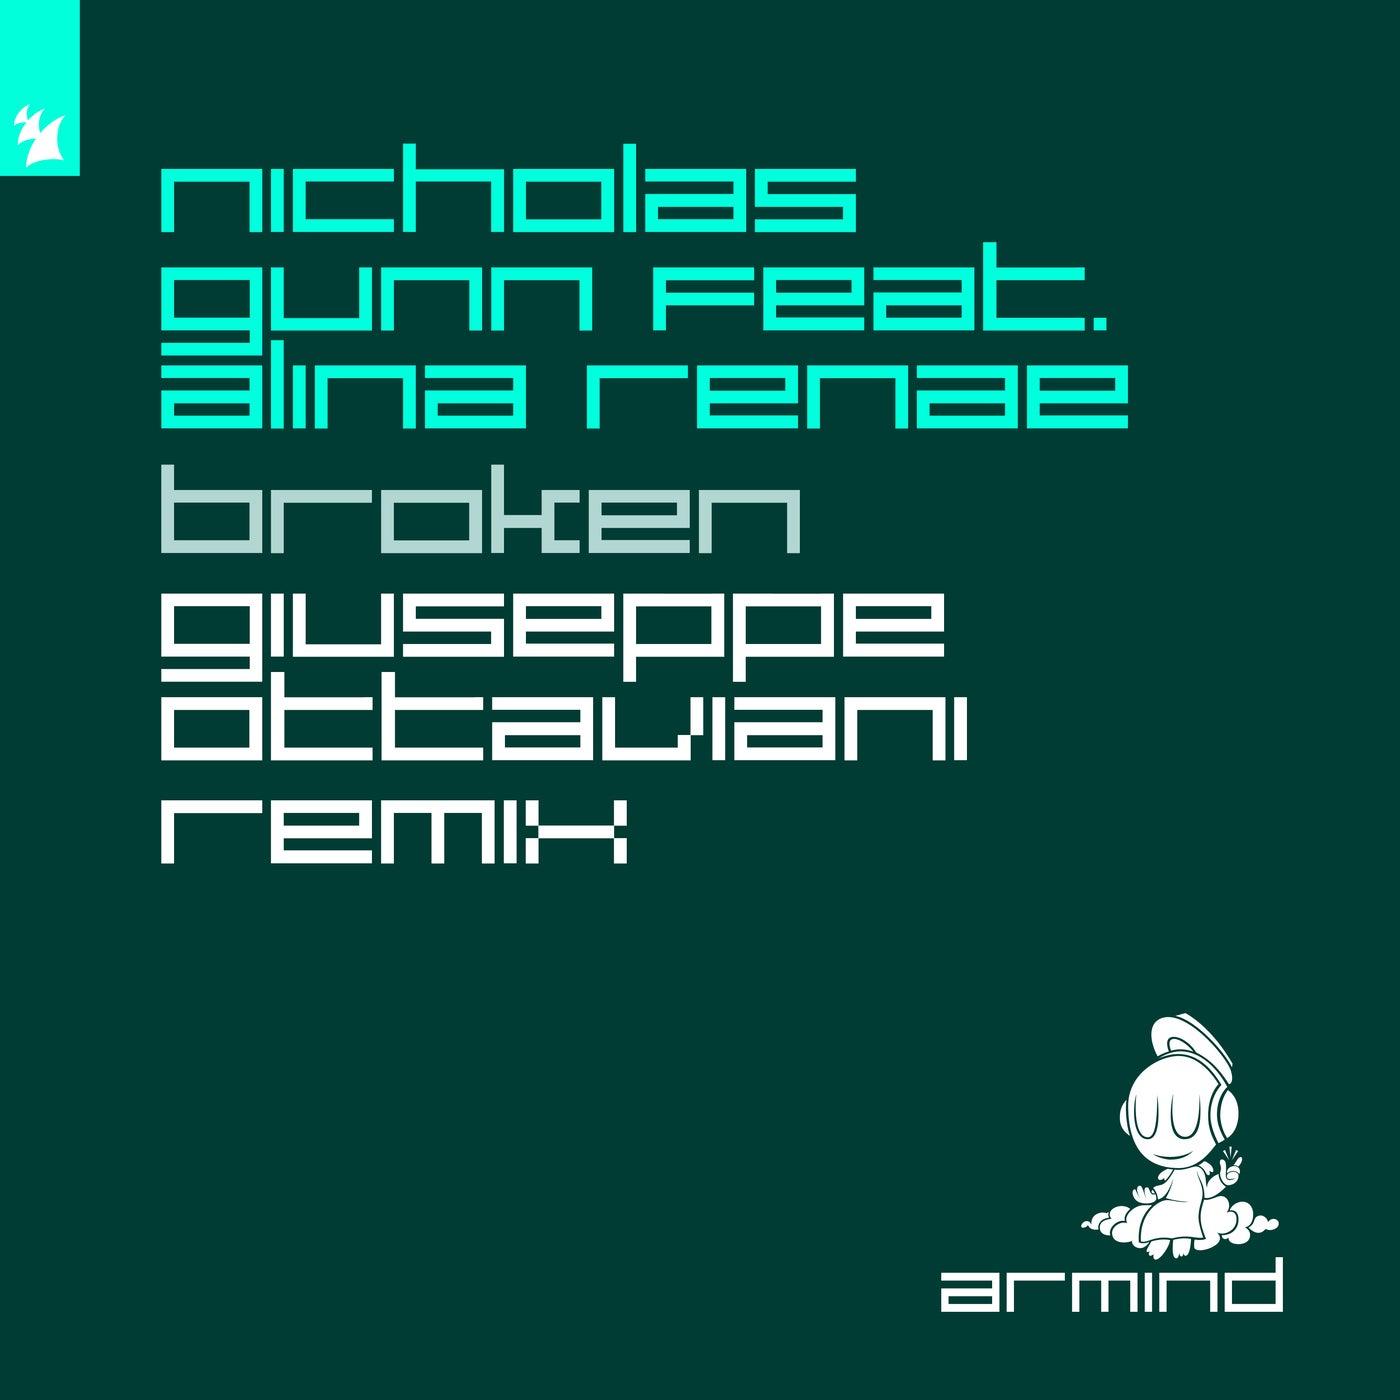 Broken feat. Alina Renae (Giuseppe Ottaviani Extended Remix)